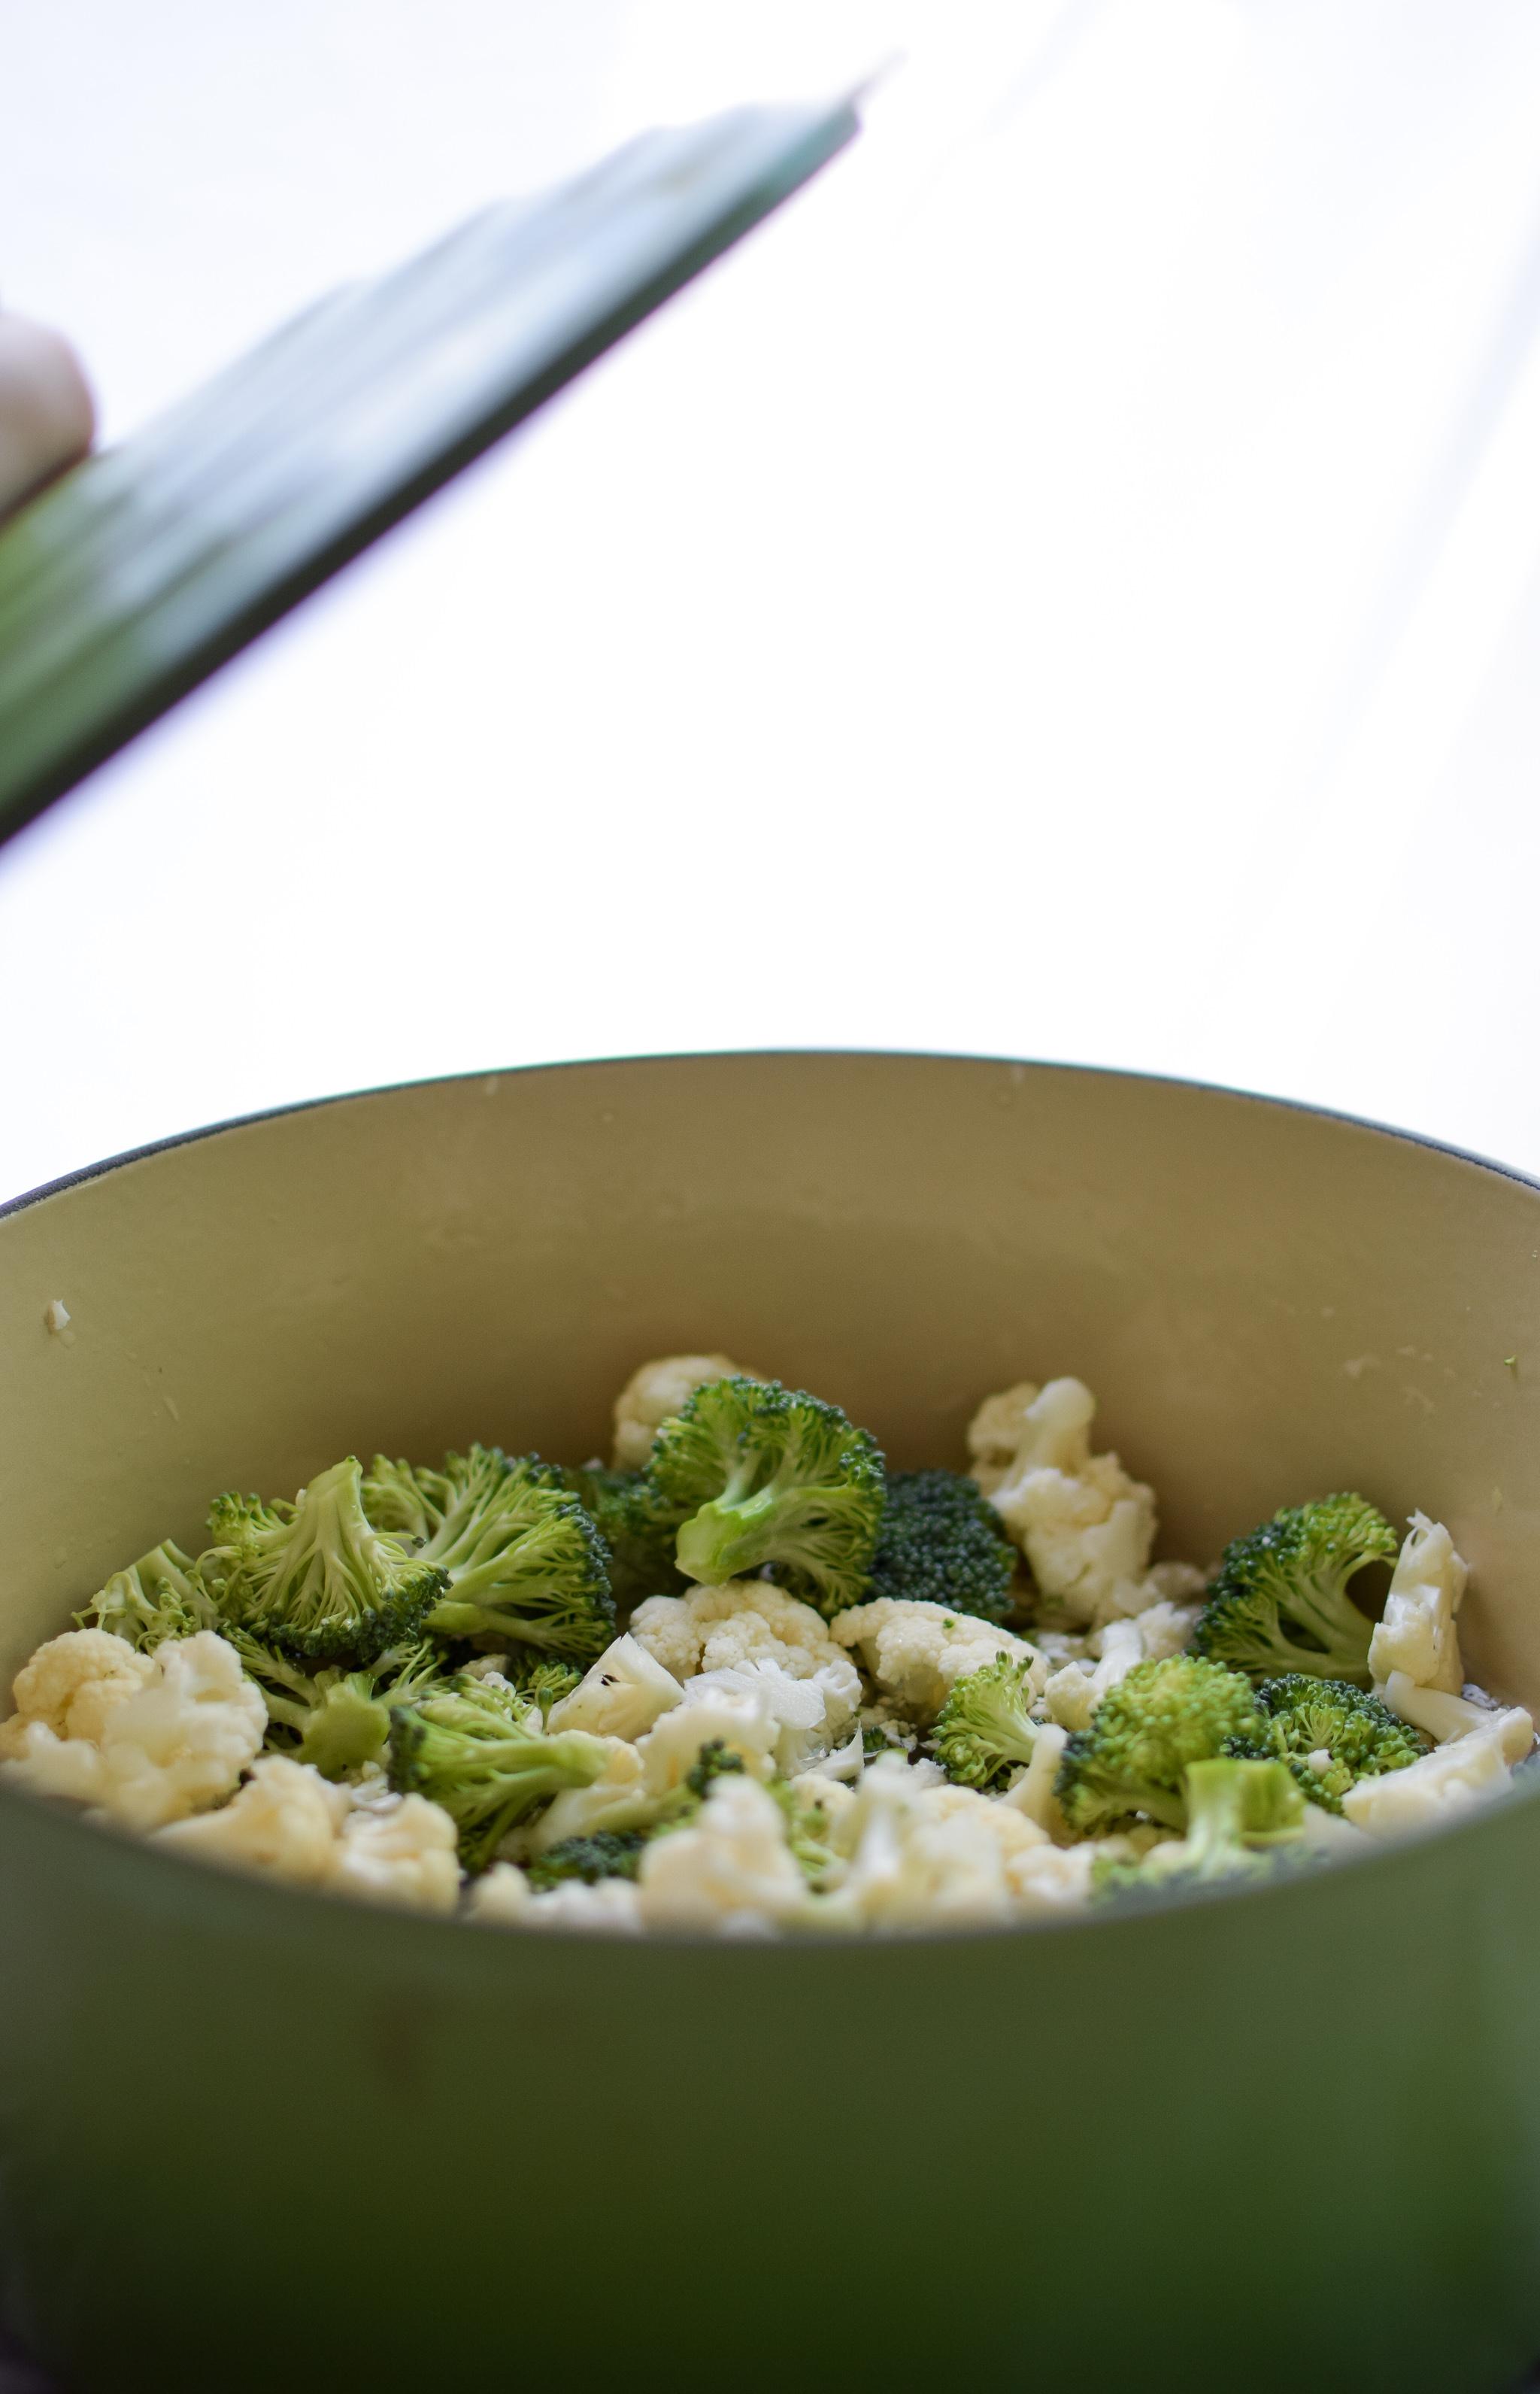 Broccoli and cauliflower ready for the Veggie Loaded Rotisserie Chicken Casserole.